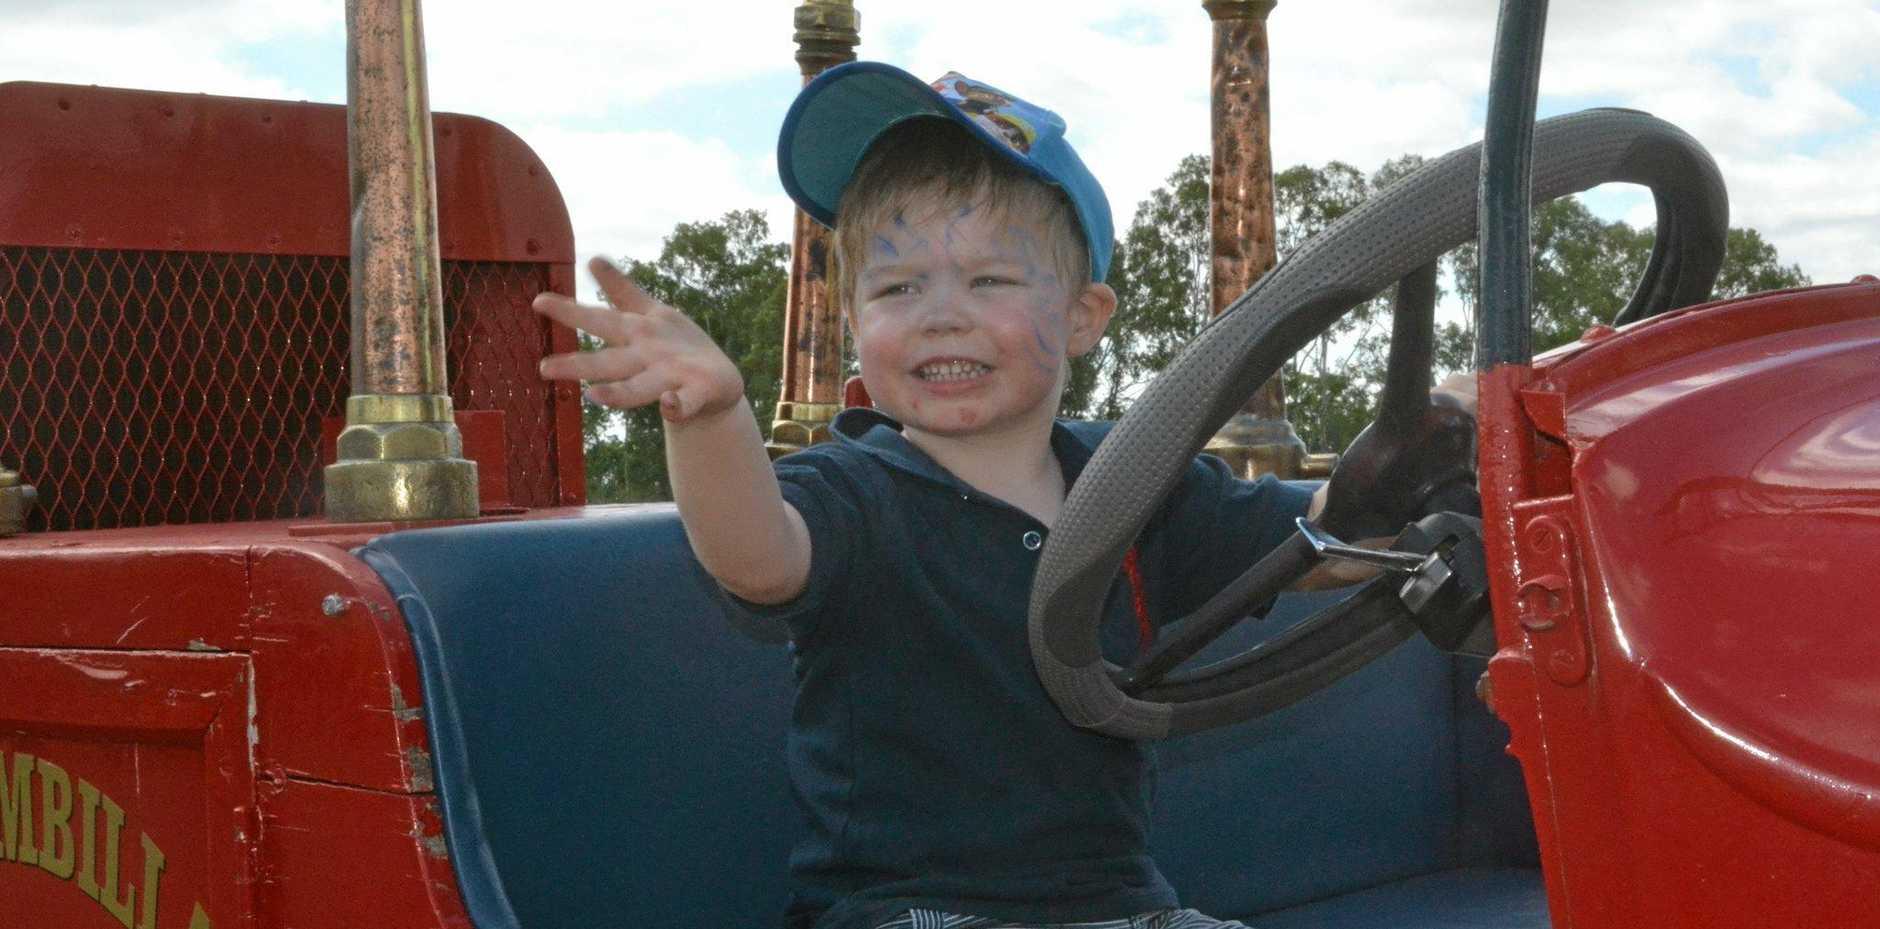 Henry Ditchburn loves riding the Wallumbilla fire truck on Australia Day.